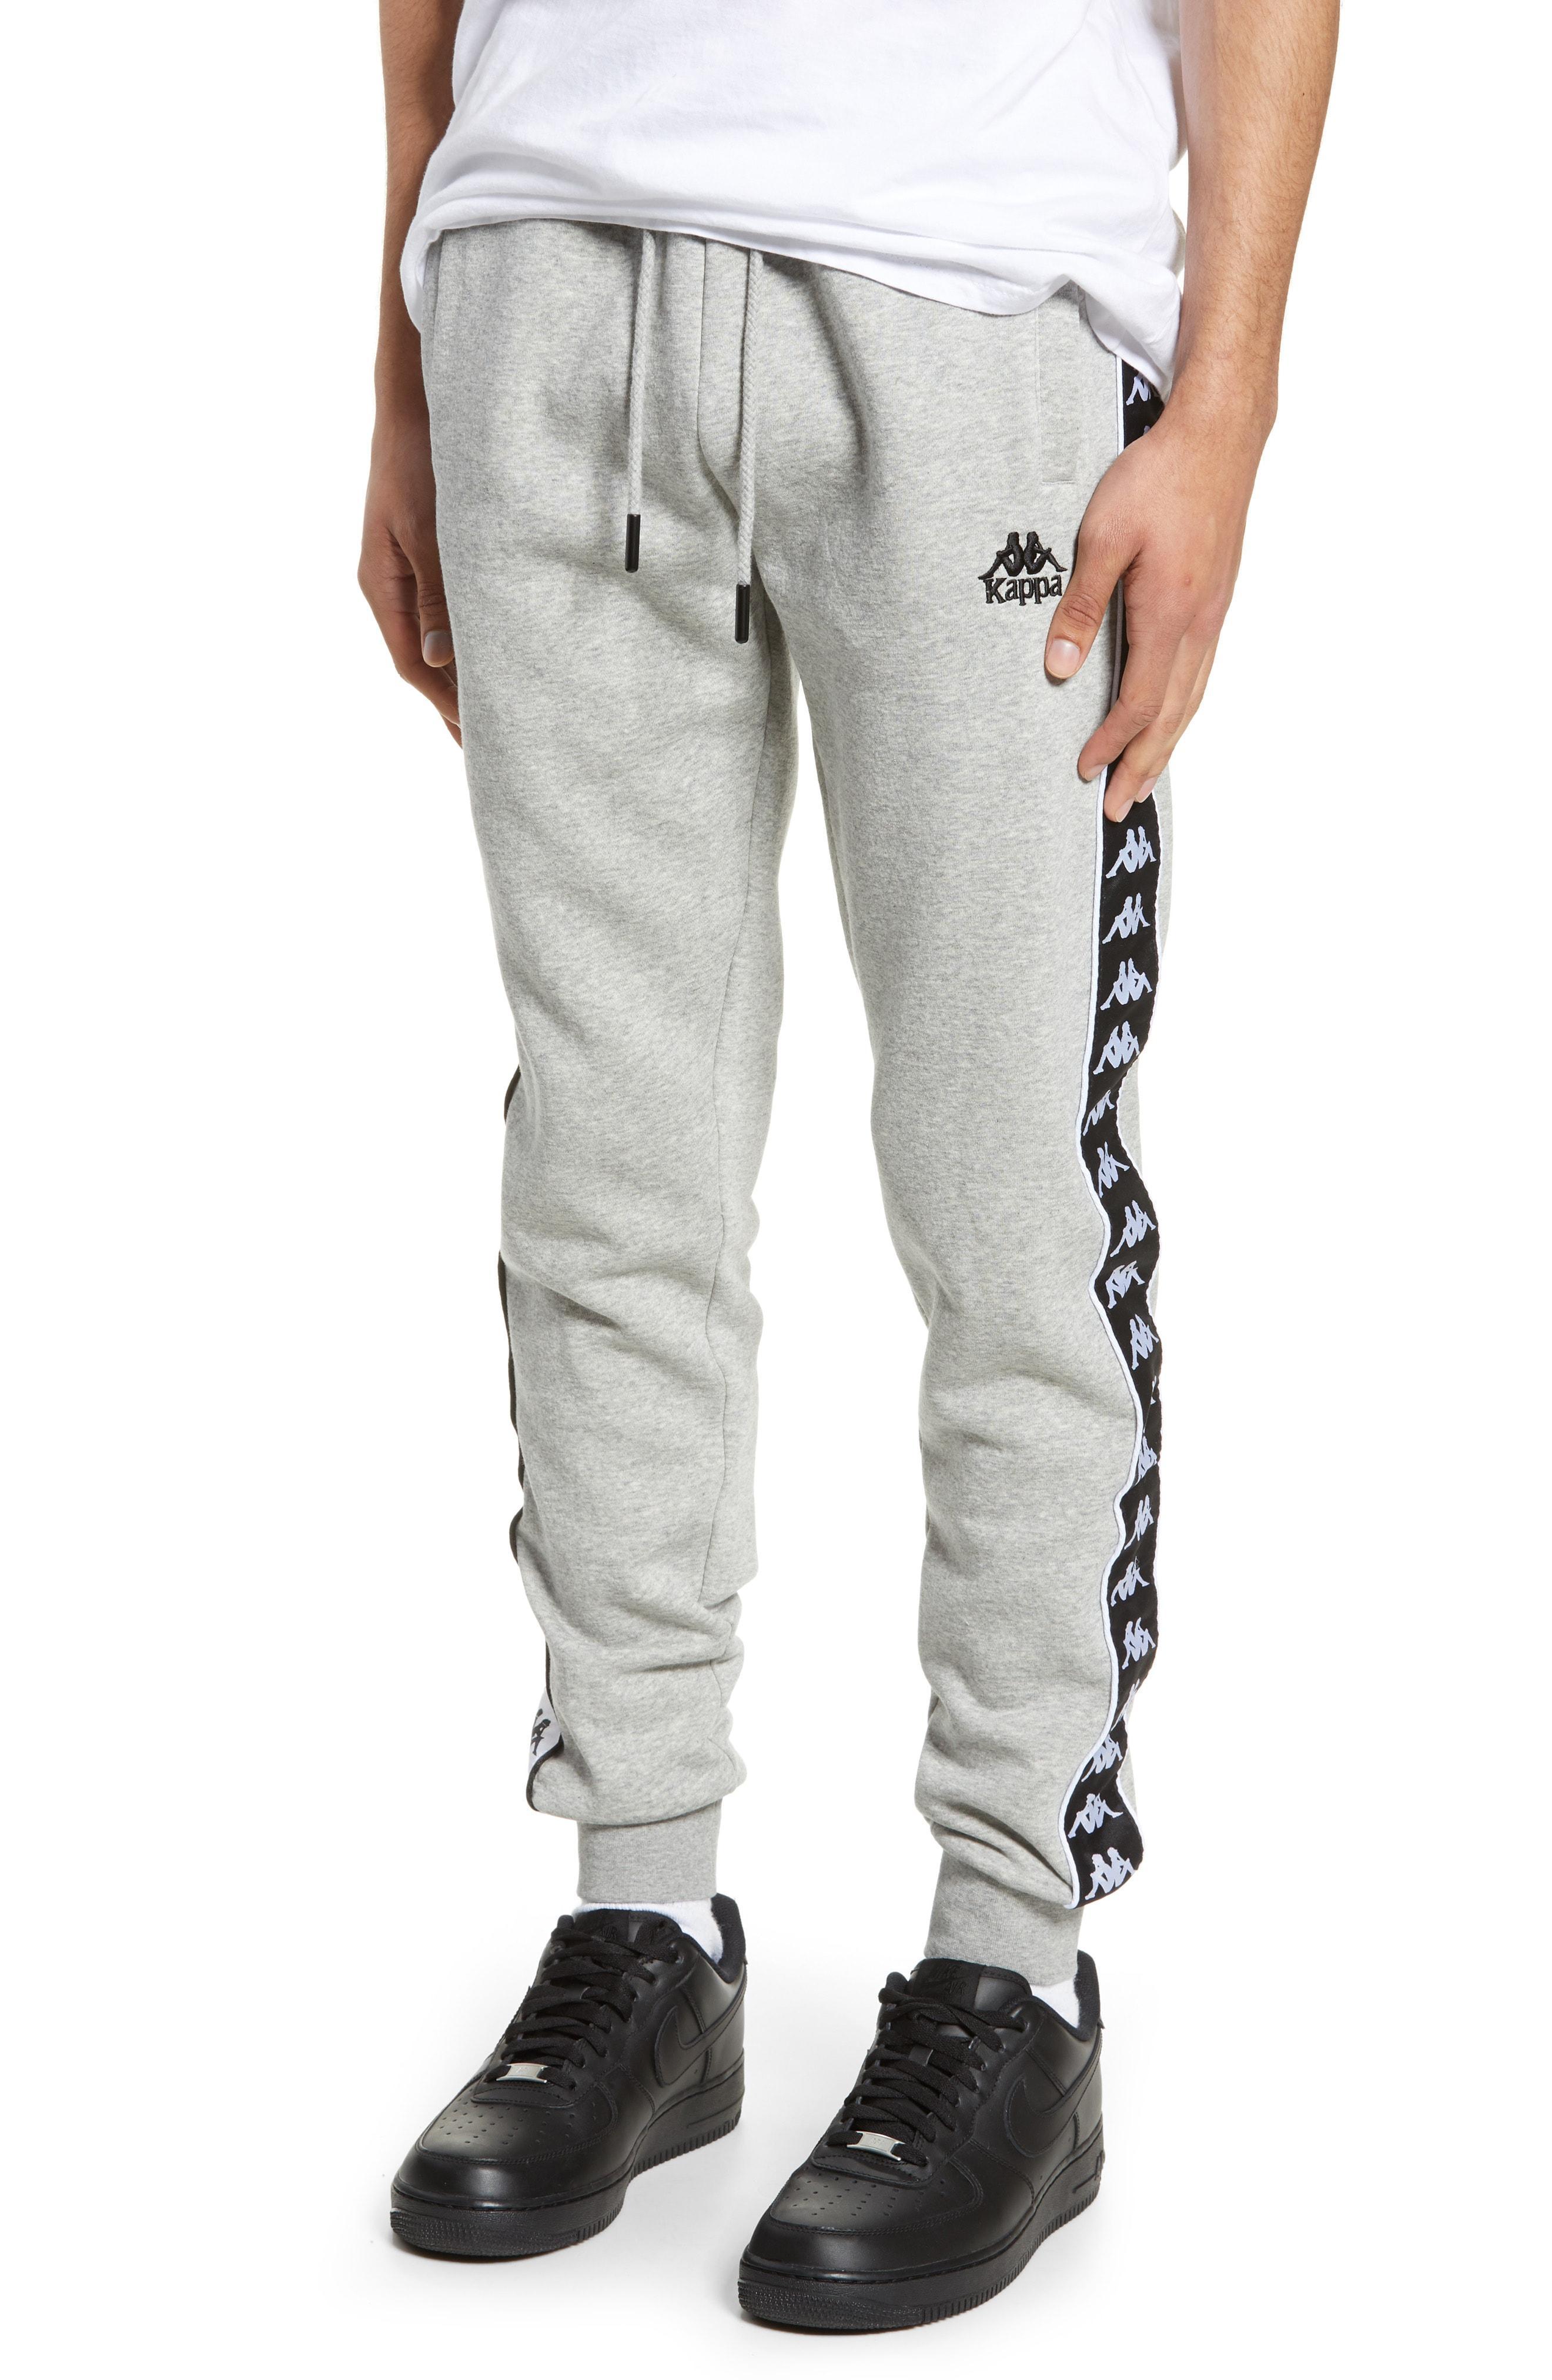 deb5bff594 Lyst - Kappa Active 222 Banda Alanz Slim Sweatpants in Gray for Men